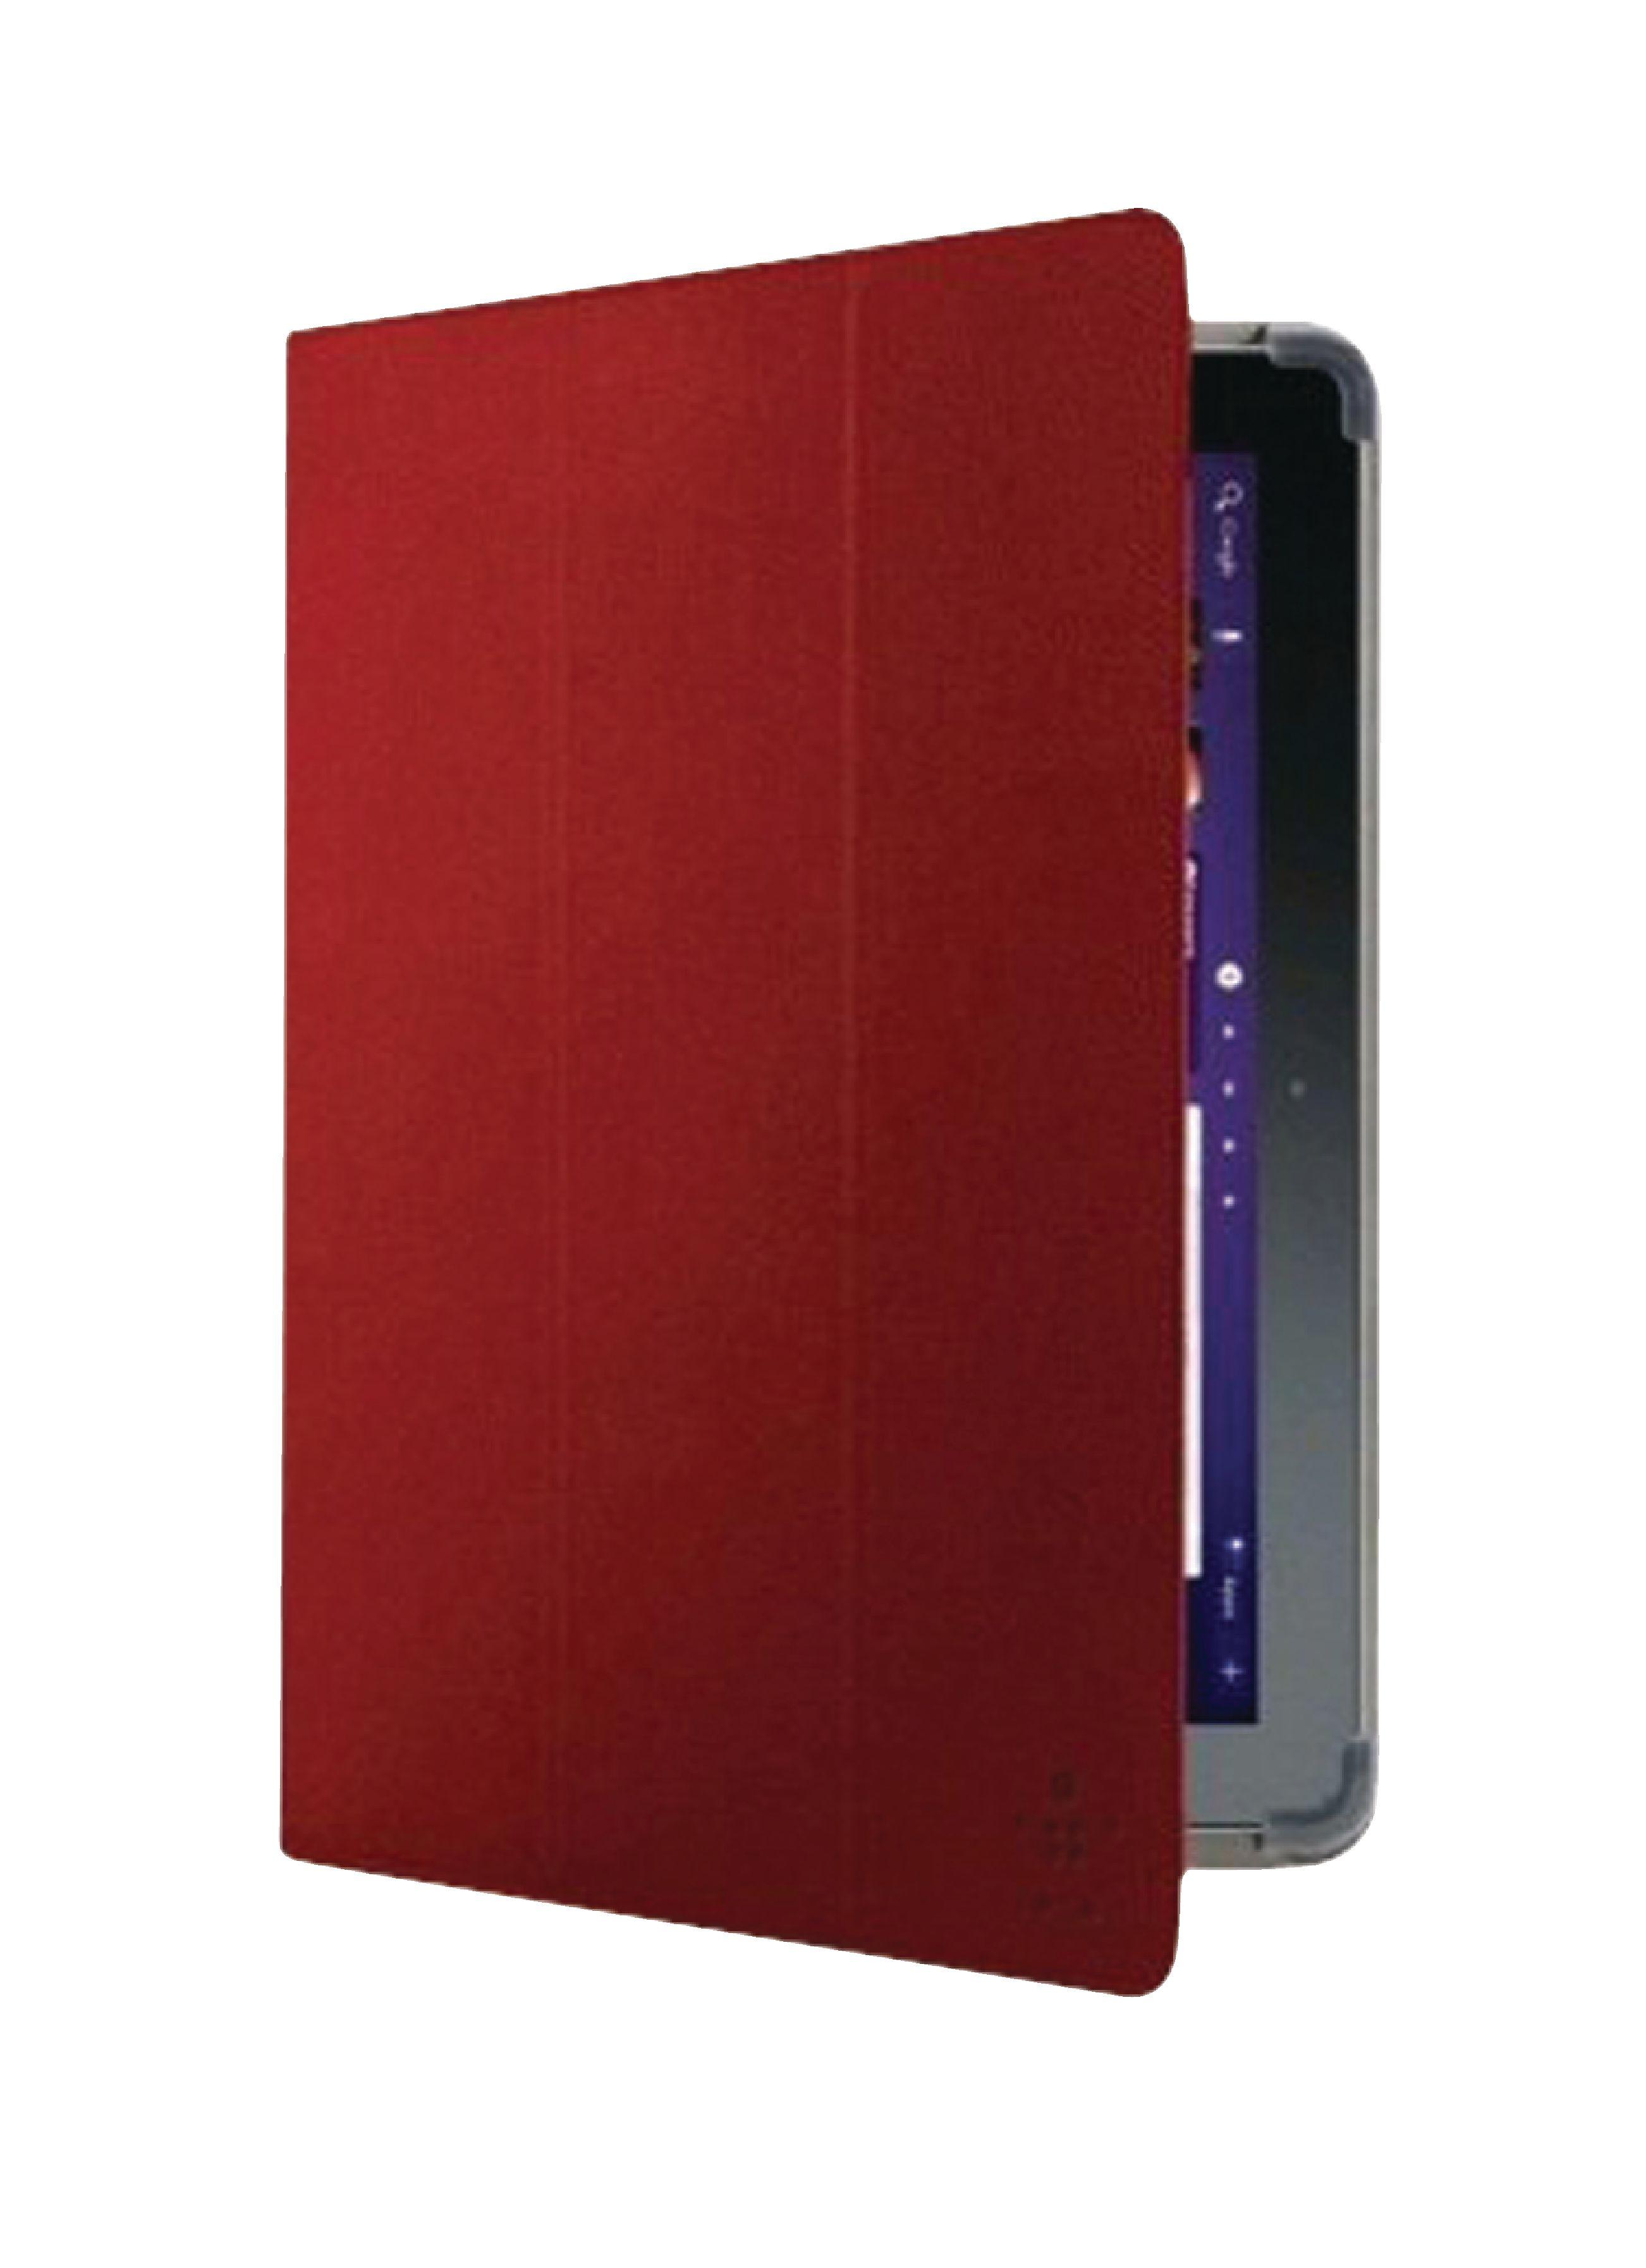 accbel00952b belkin etui de protection pour tablette portfolio samsung galaxy tab 3 10 1. Black Bedroom Furniture Sets. Home Design Ideas